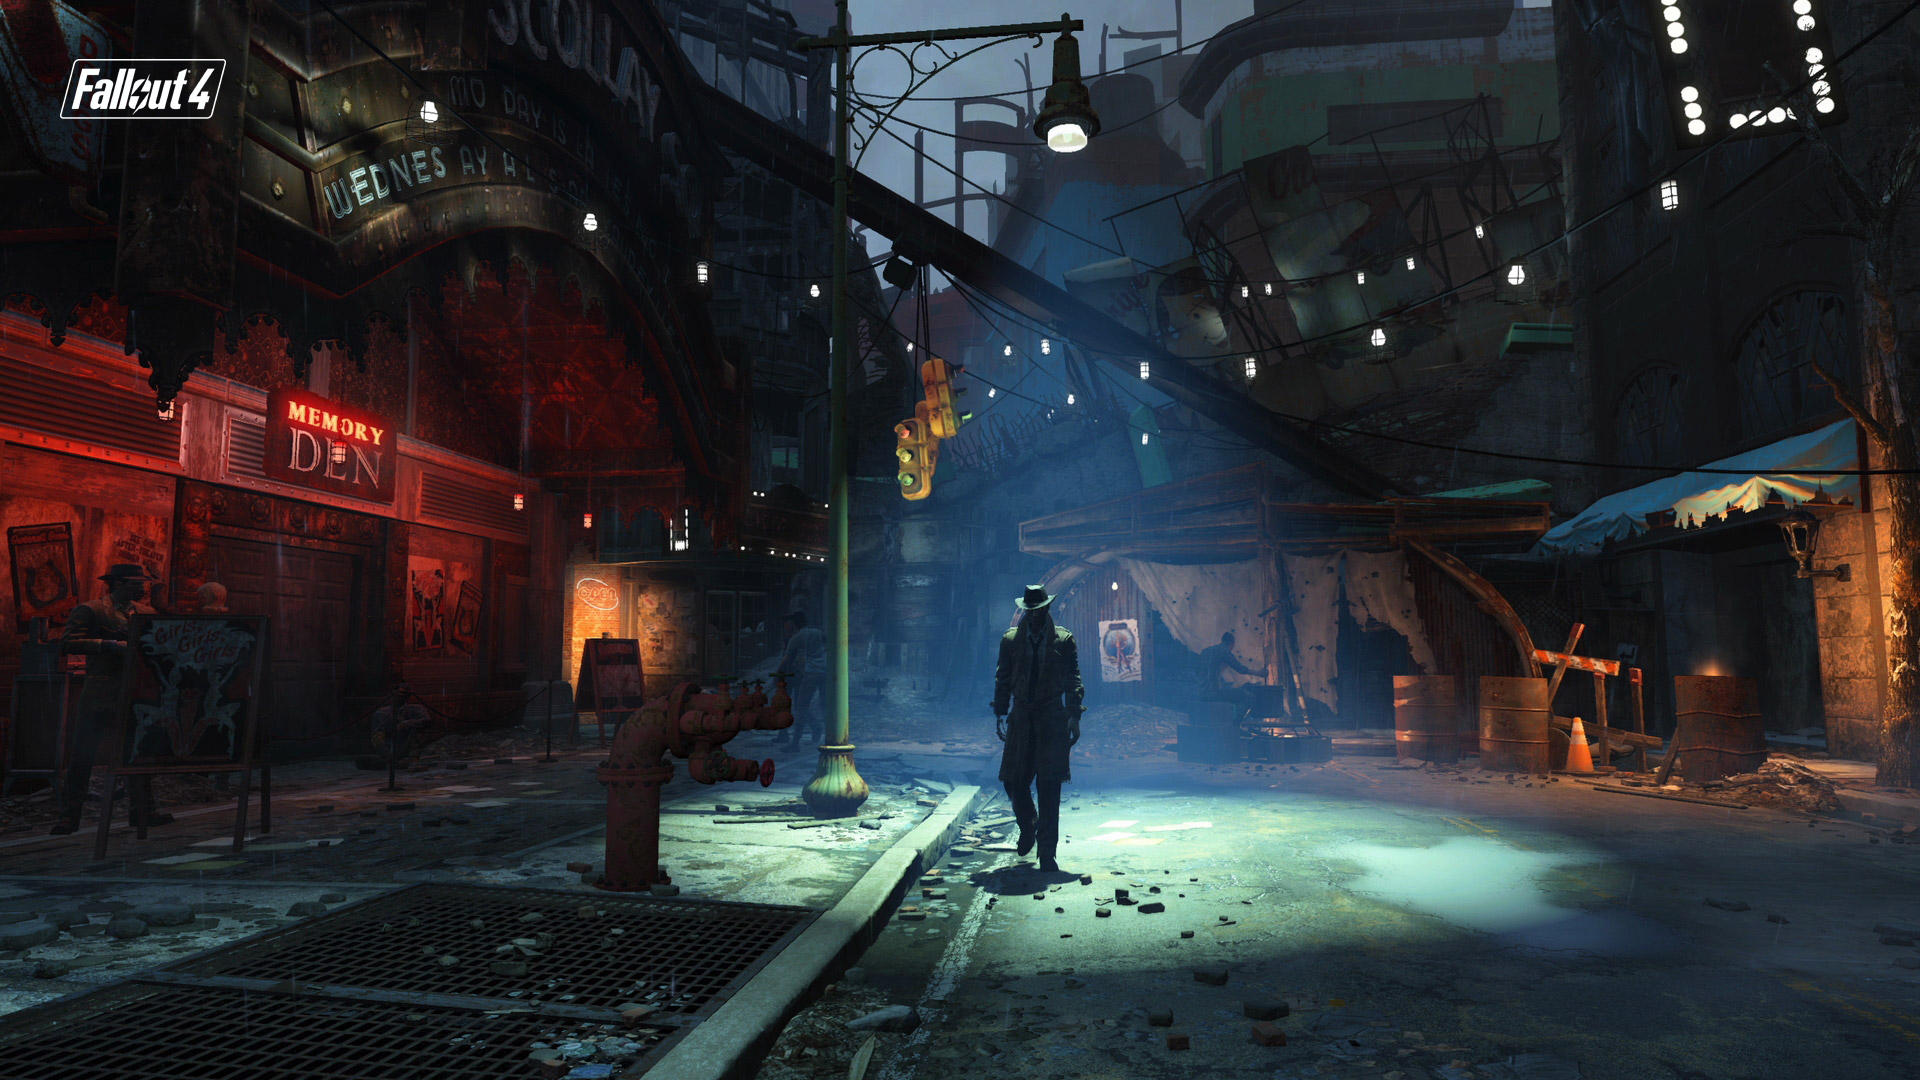 Free Fallout 4 Wallpaper in 1920x1080